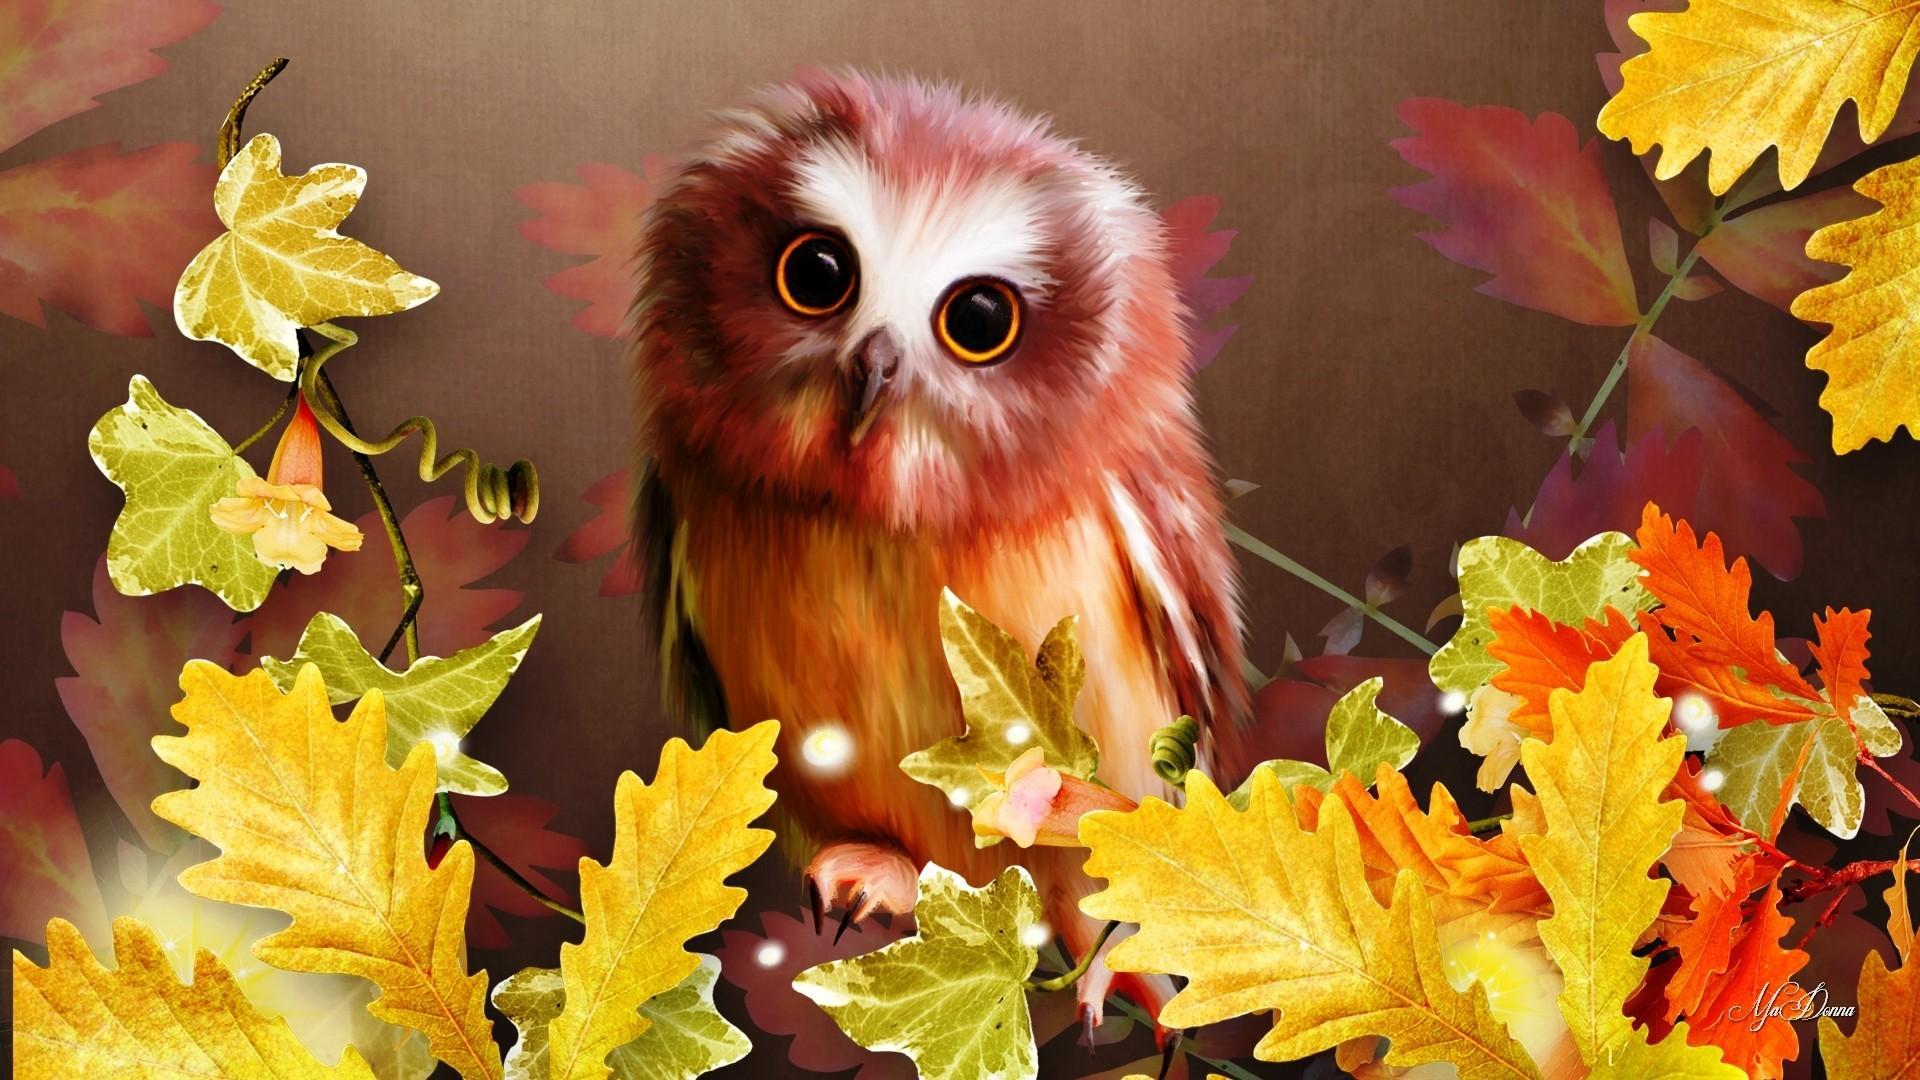 Res: 1920x1080, Autumn Leaves Quotes 2560x1600